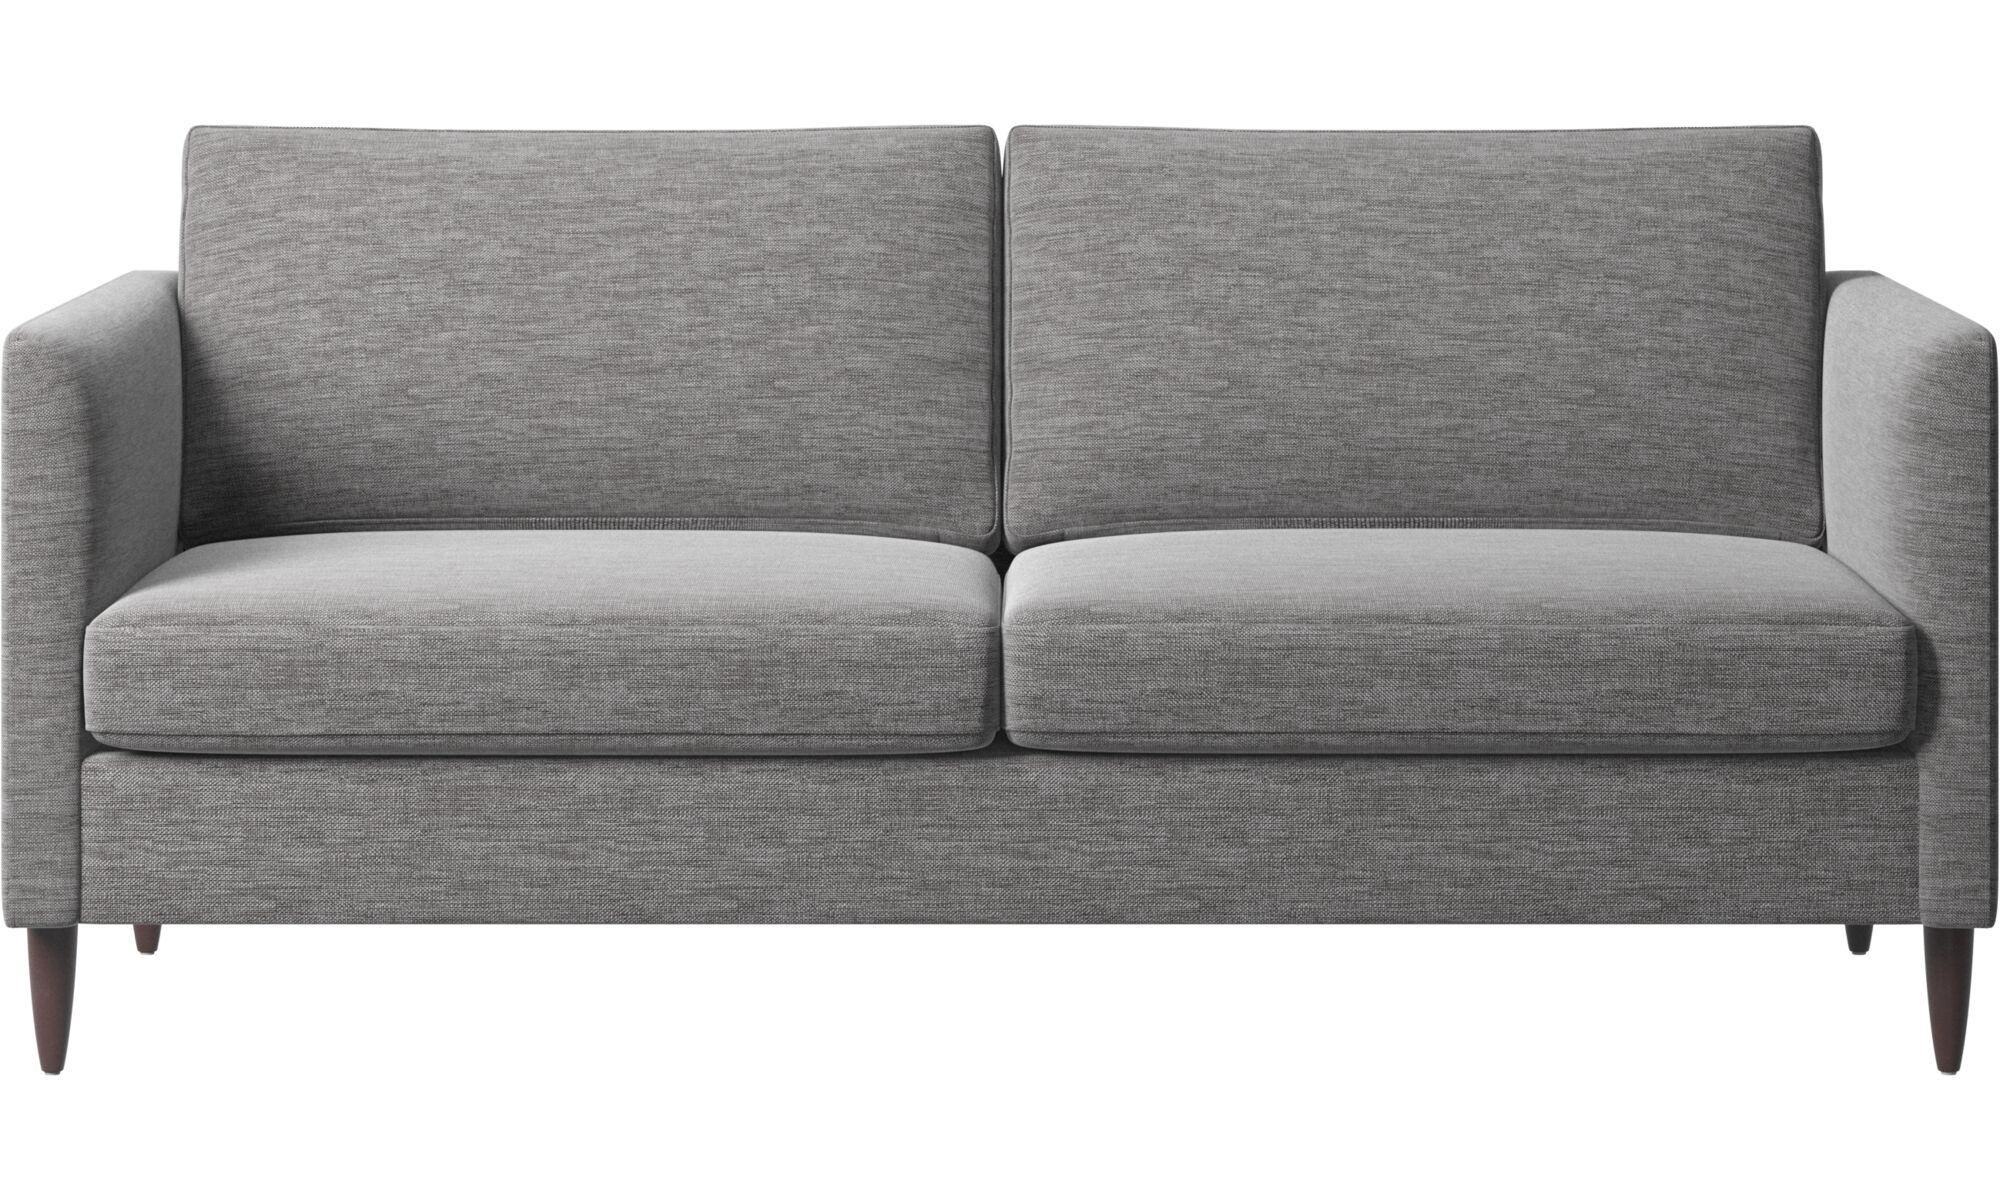 2½ personers sofaer - Indivi sofa - Grå - Stof